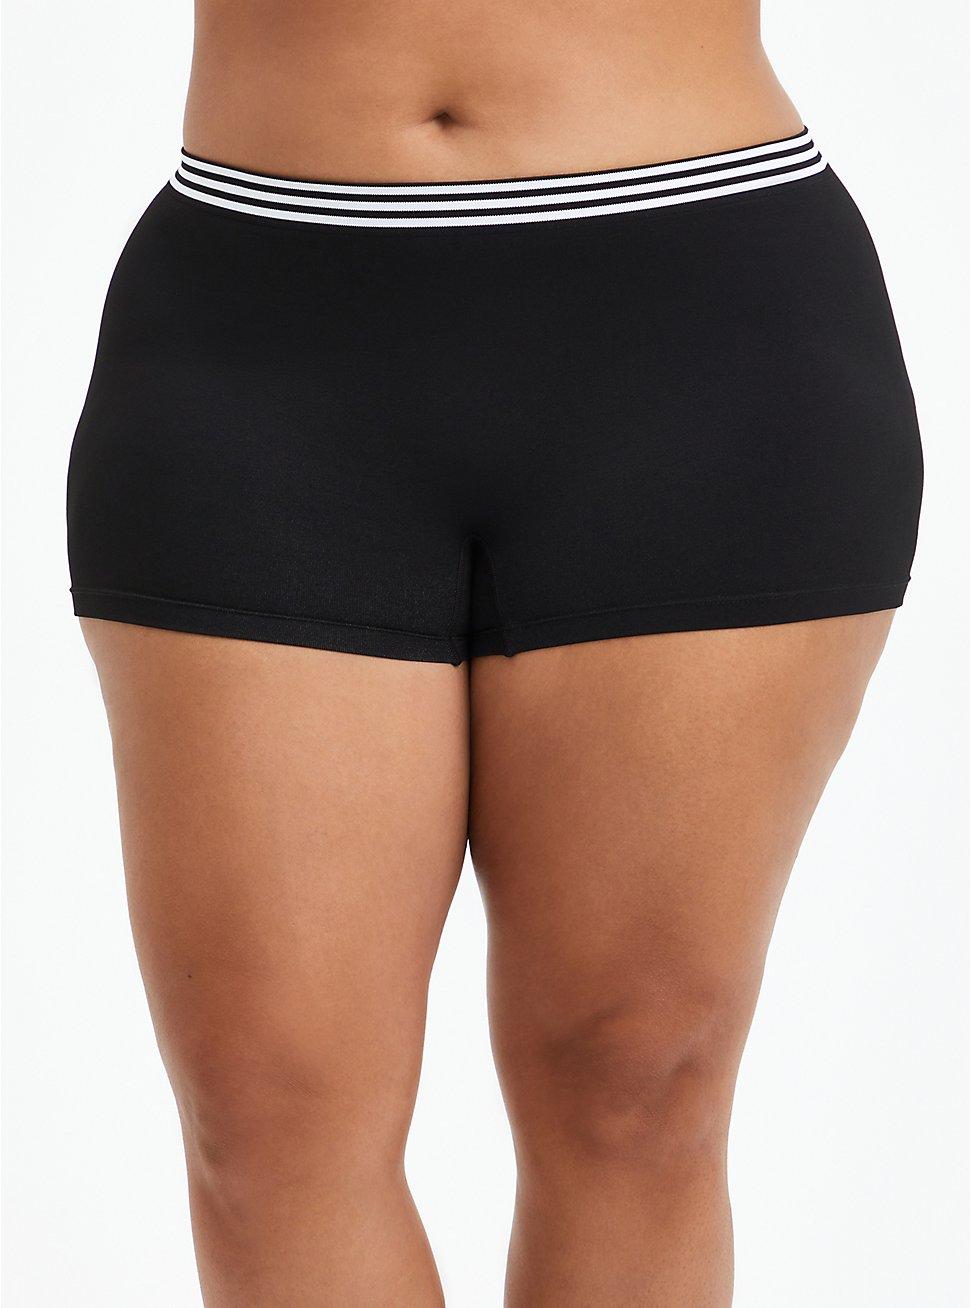 Seamless Boyshort Panty - Stripe Black, RICH BLACK, hi-res